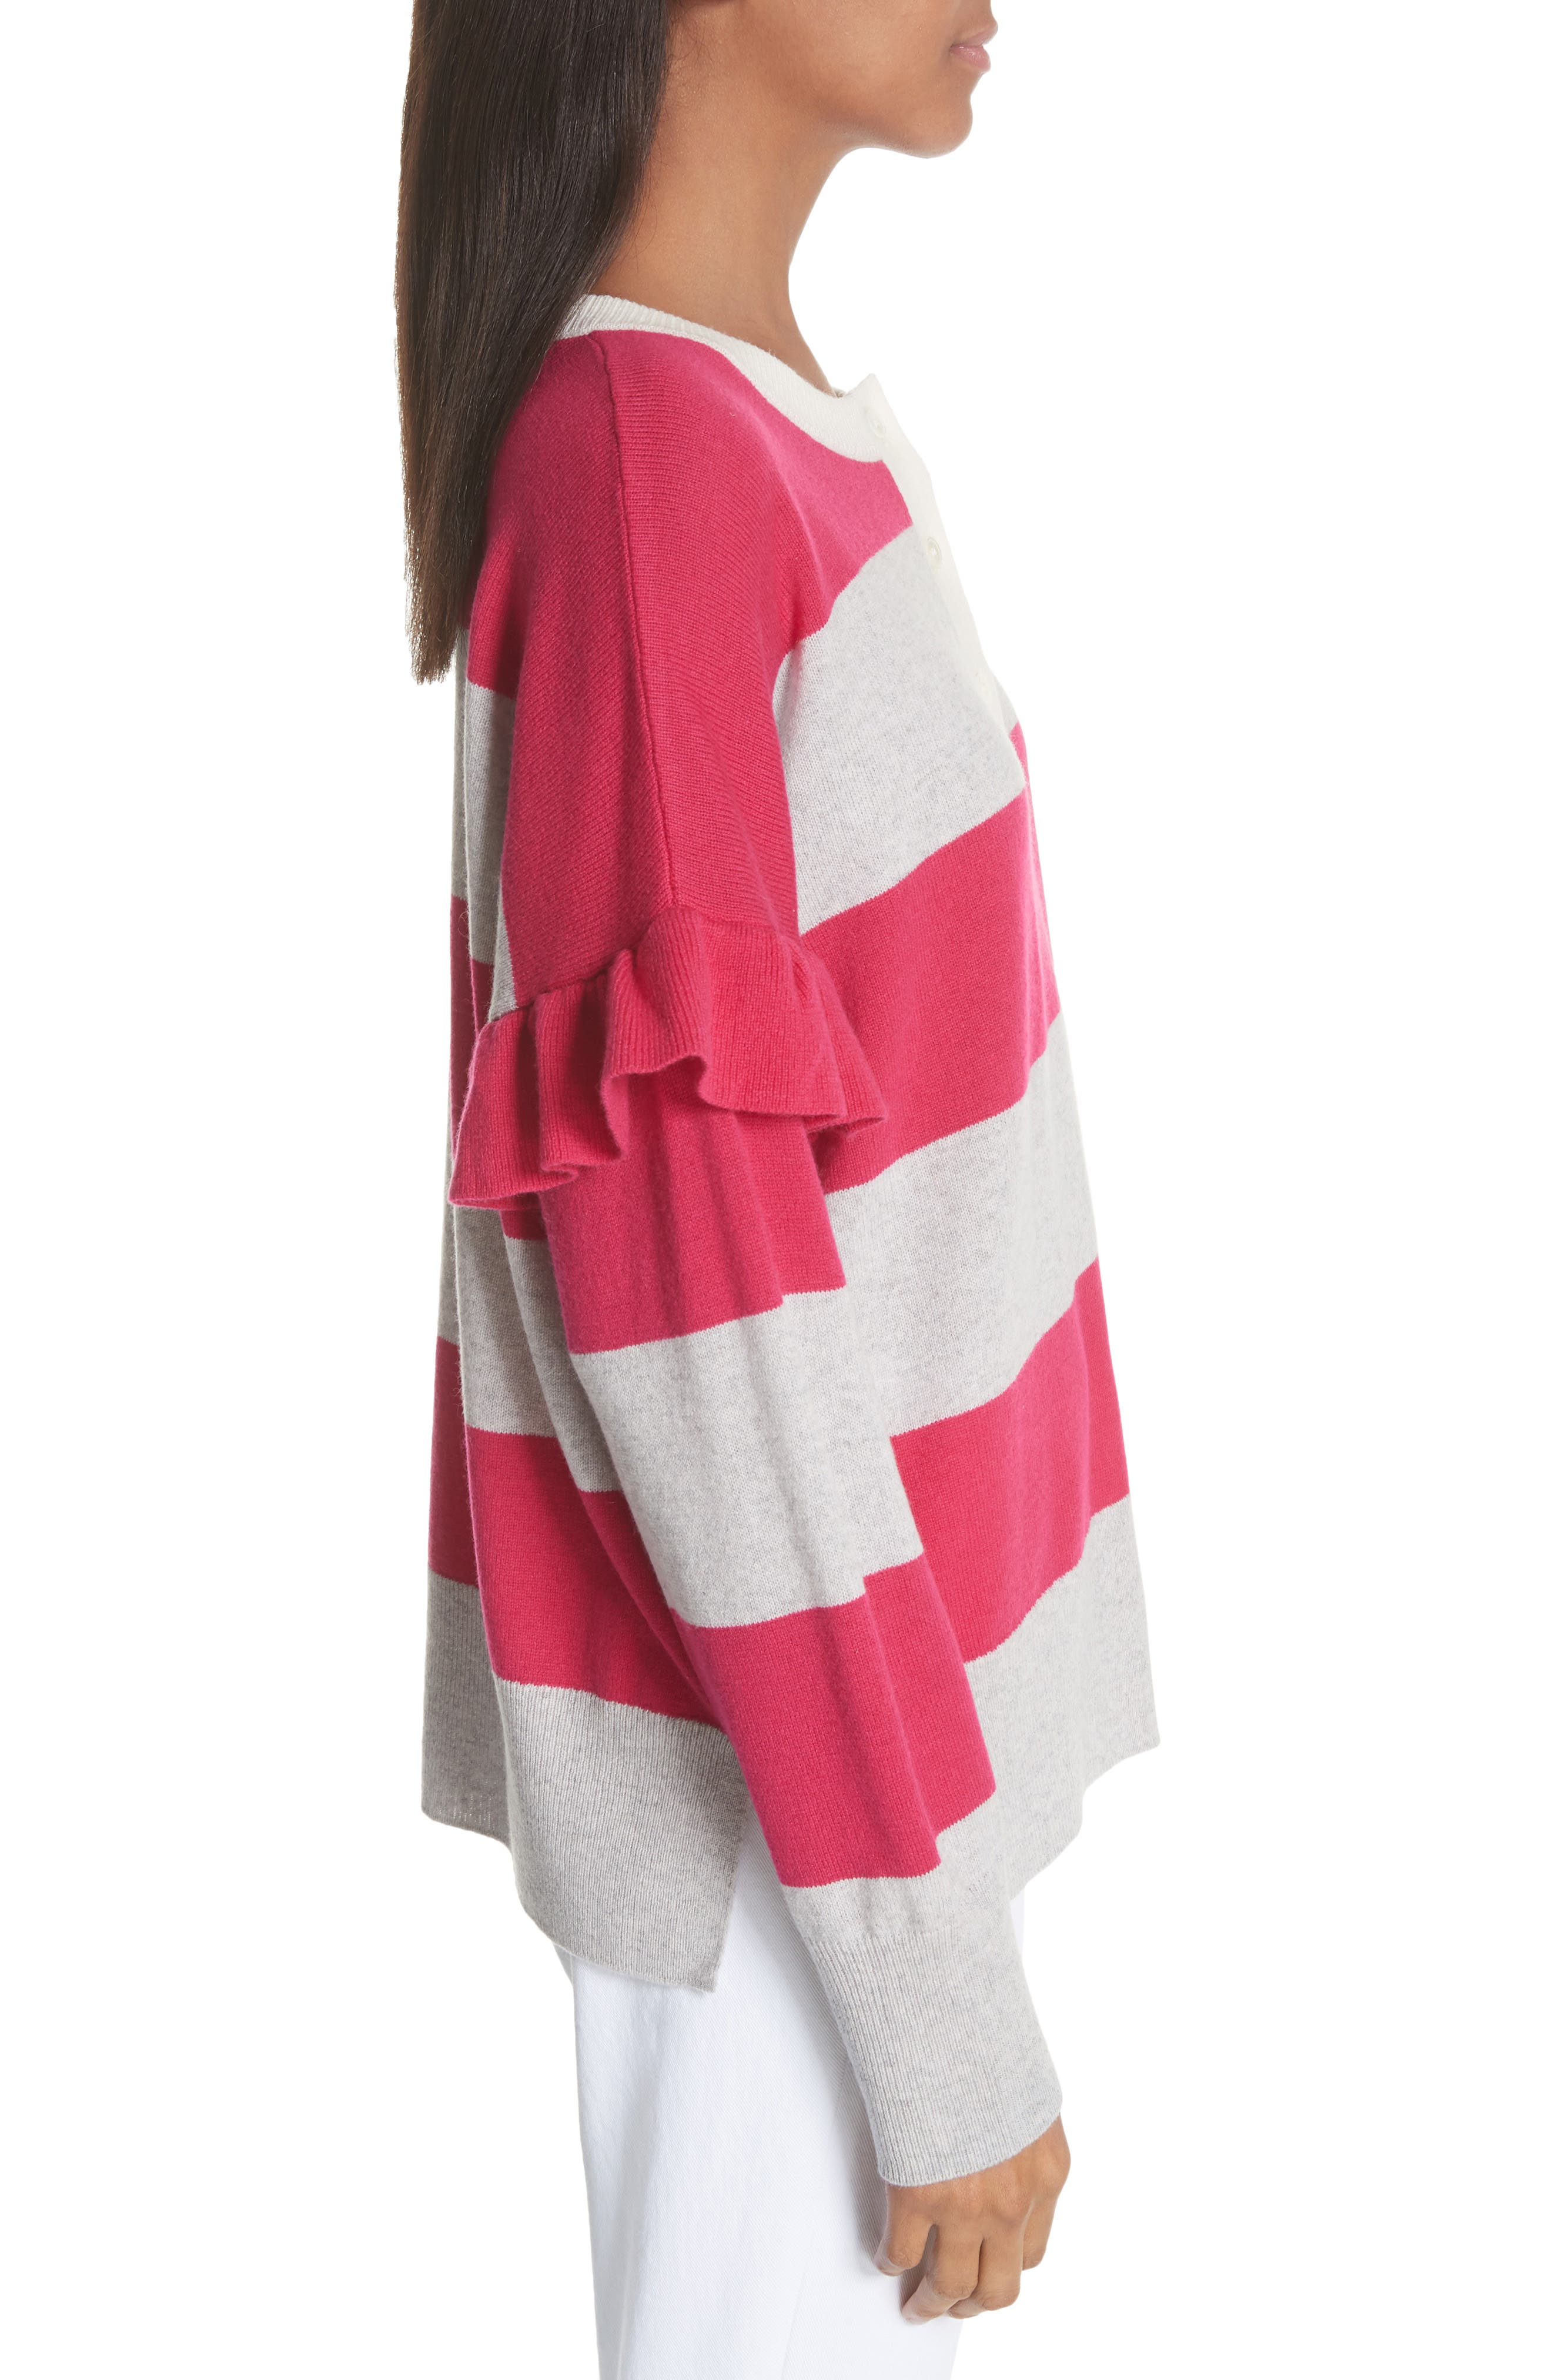 Inghin Stripe Wool & Cashmere Sweater,                             Alternate thumbnail 3, color,                             Hacienda/ Heather Grey